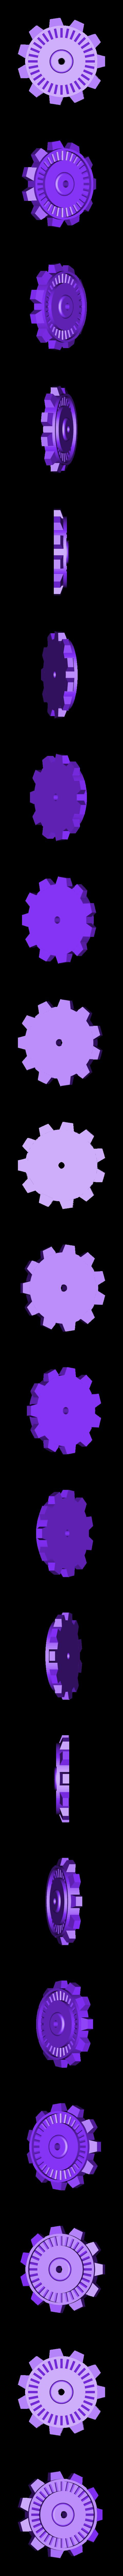 bio_cog.stl Download free STL file Bioshock pistol parts • 3D printable model, caramellcube